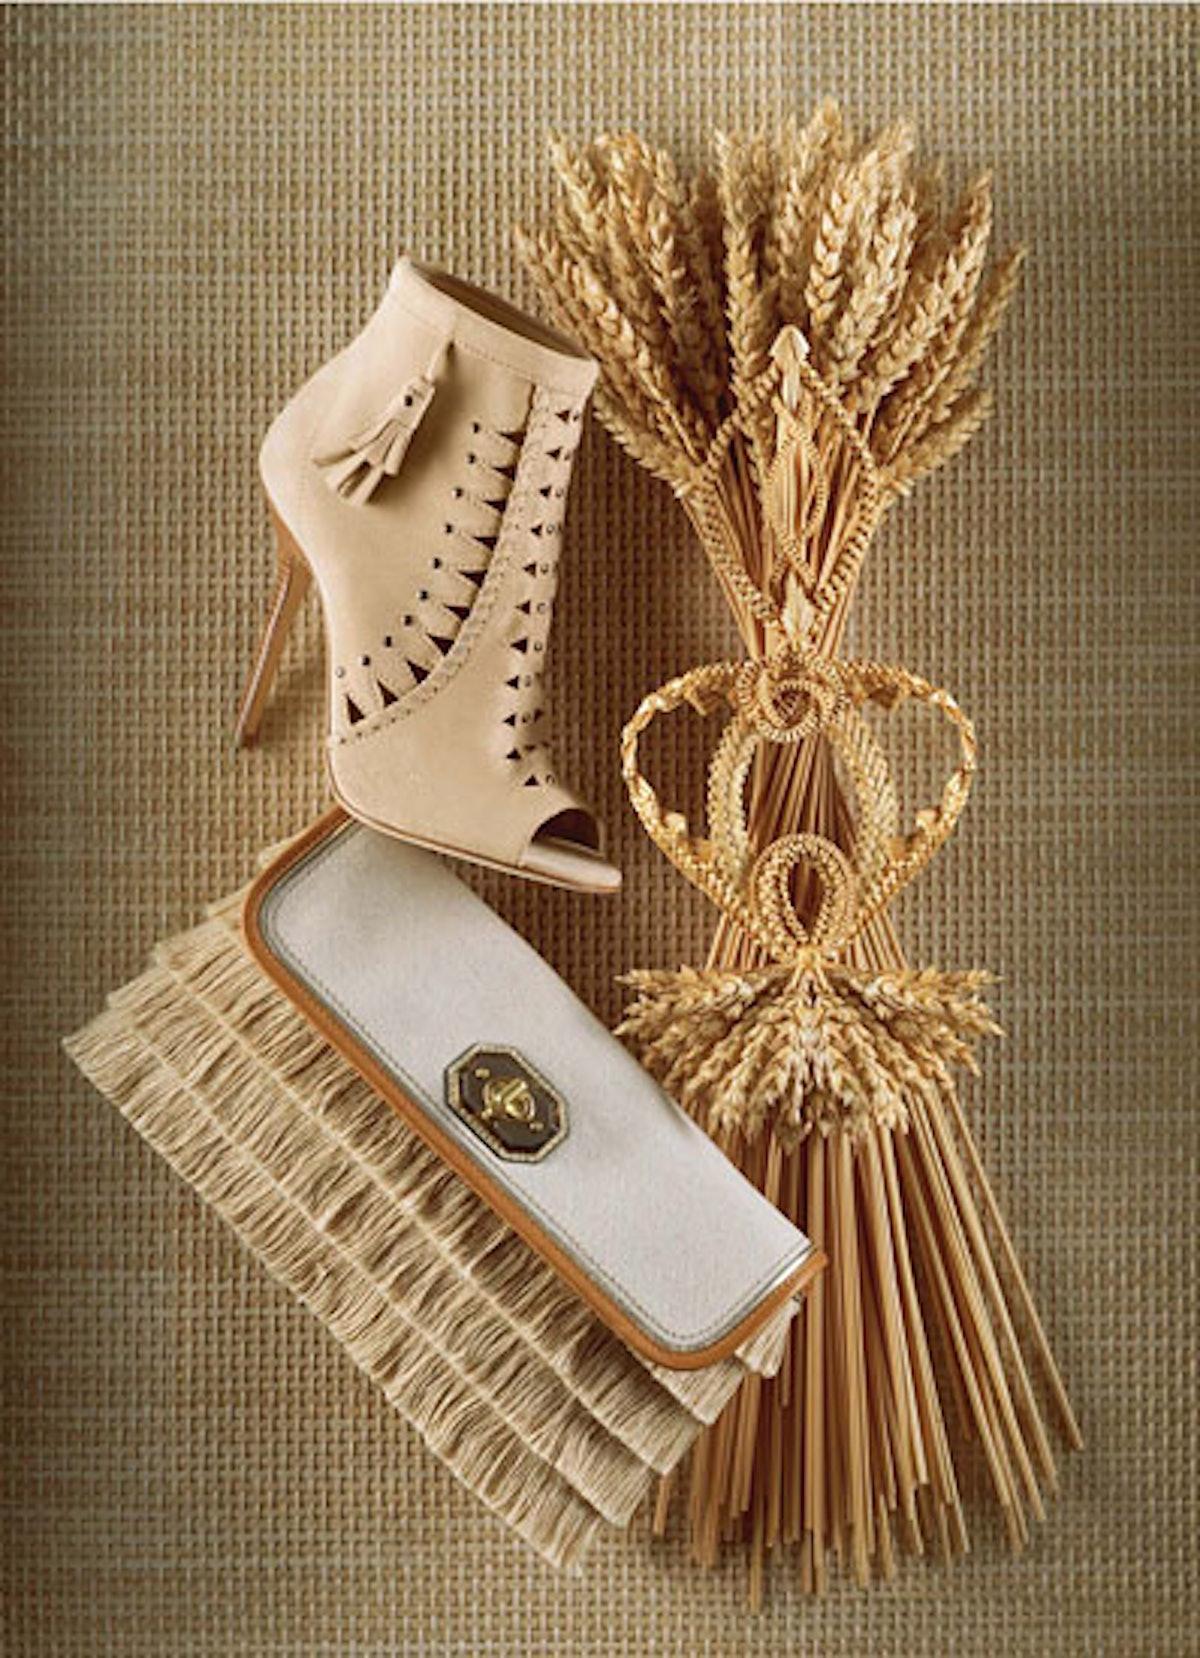 acss_western_accessories_04_v.jpg